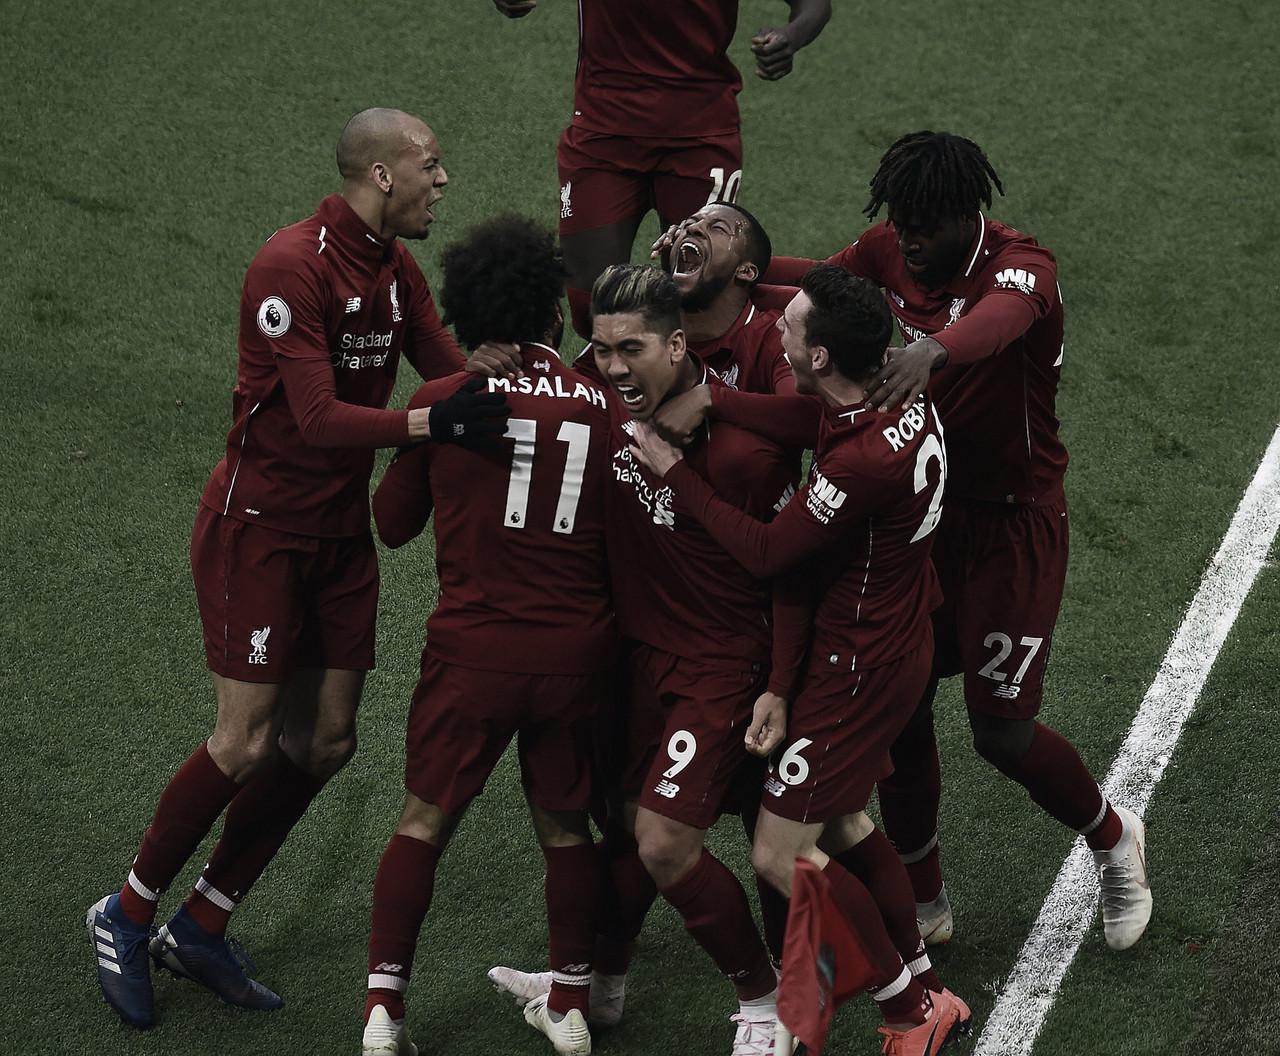 Liverpool vence Tottenham e reassume liderança da Premier League